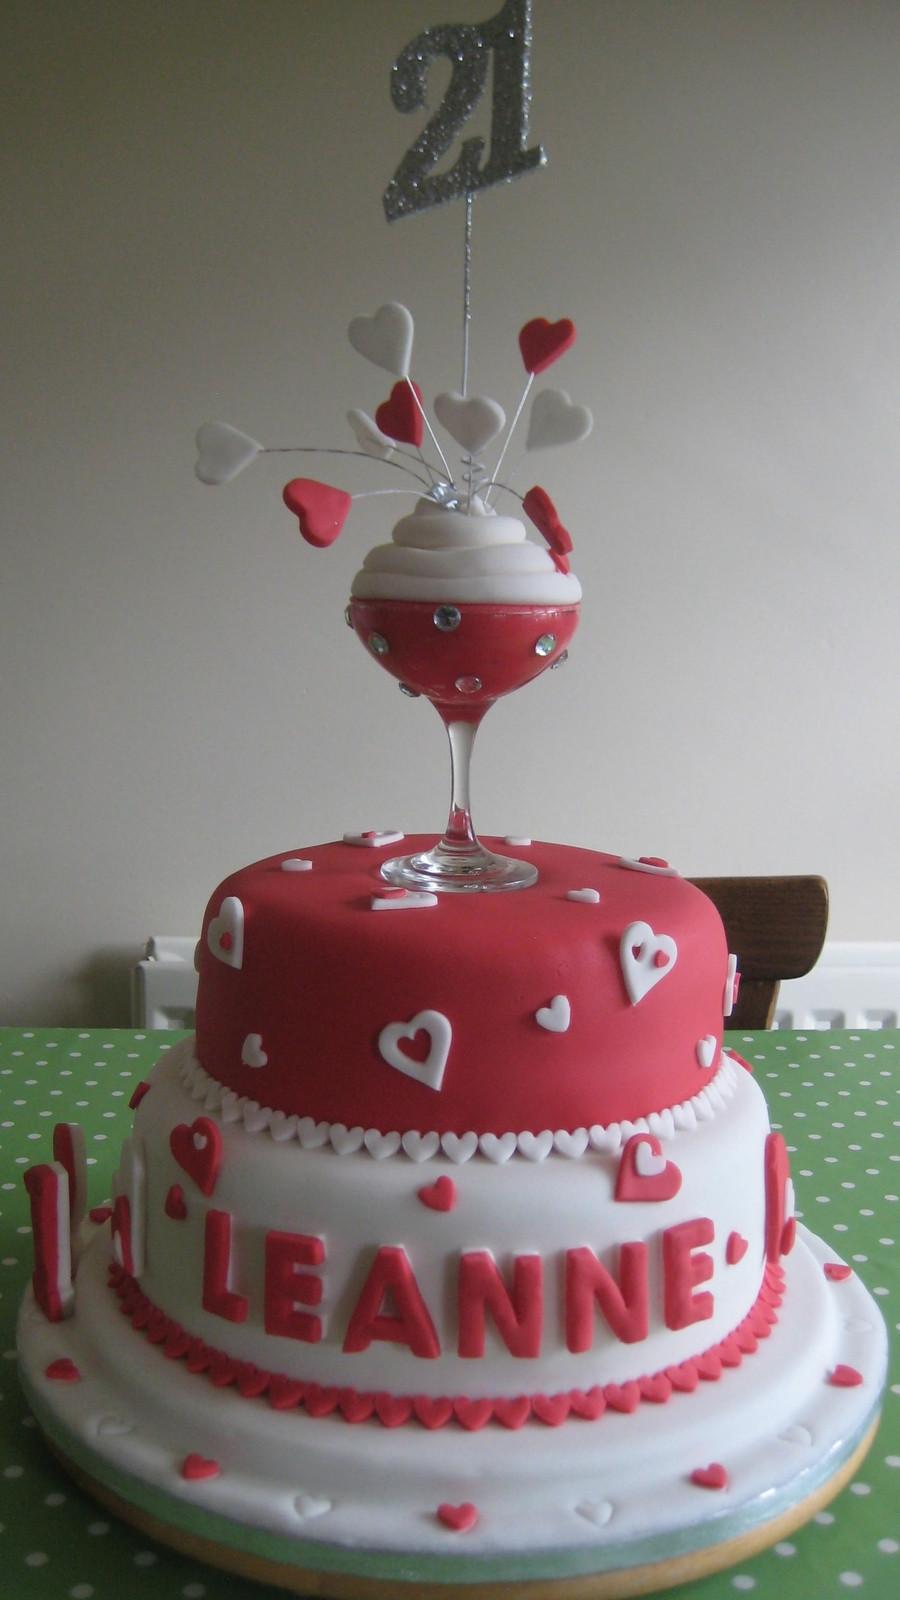 21St Birthday Cake  Champagne 21St Birthday Cake CakeCentral